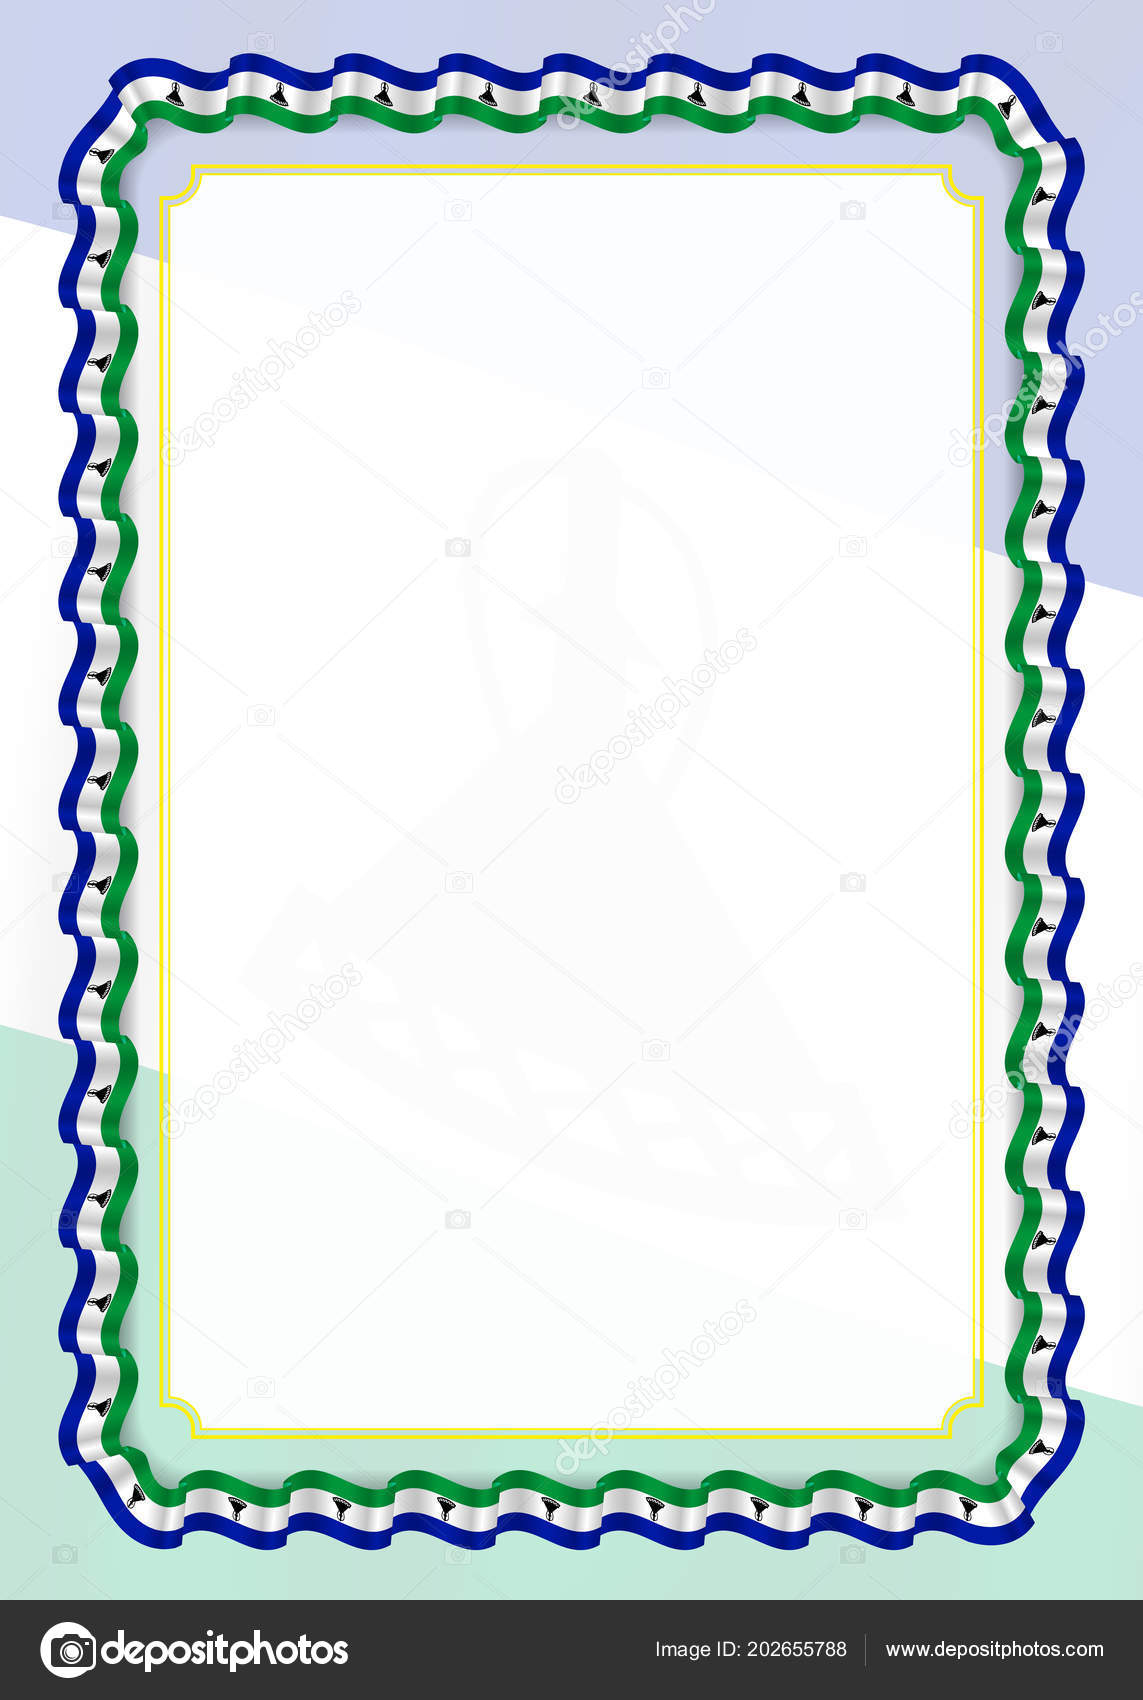 Flag Template | Frame Border Ribbon Lesotho Flag Template Elements Your Certificate